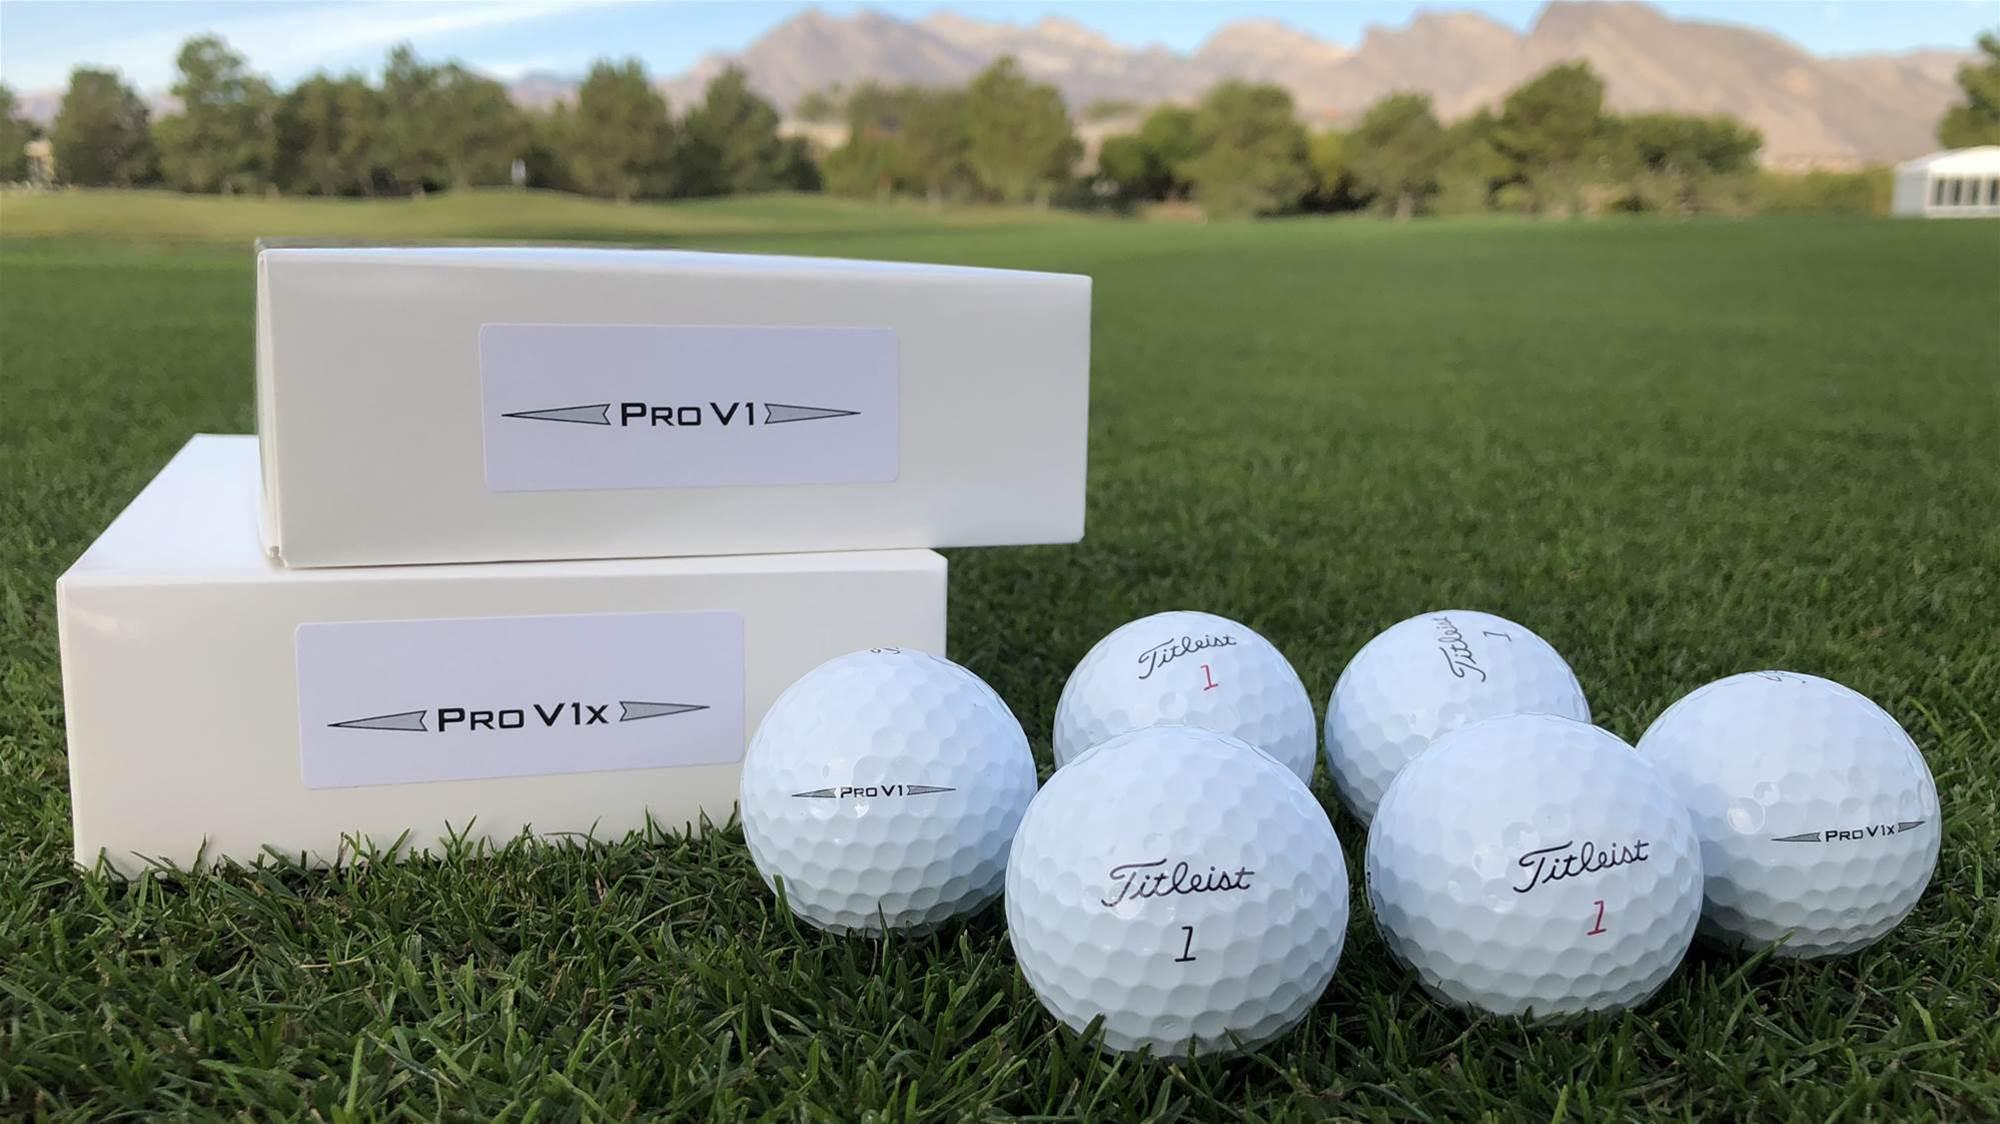 New Titleist Pro V1 and Pro V1x arrive on Tour